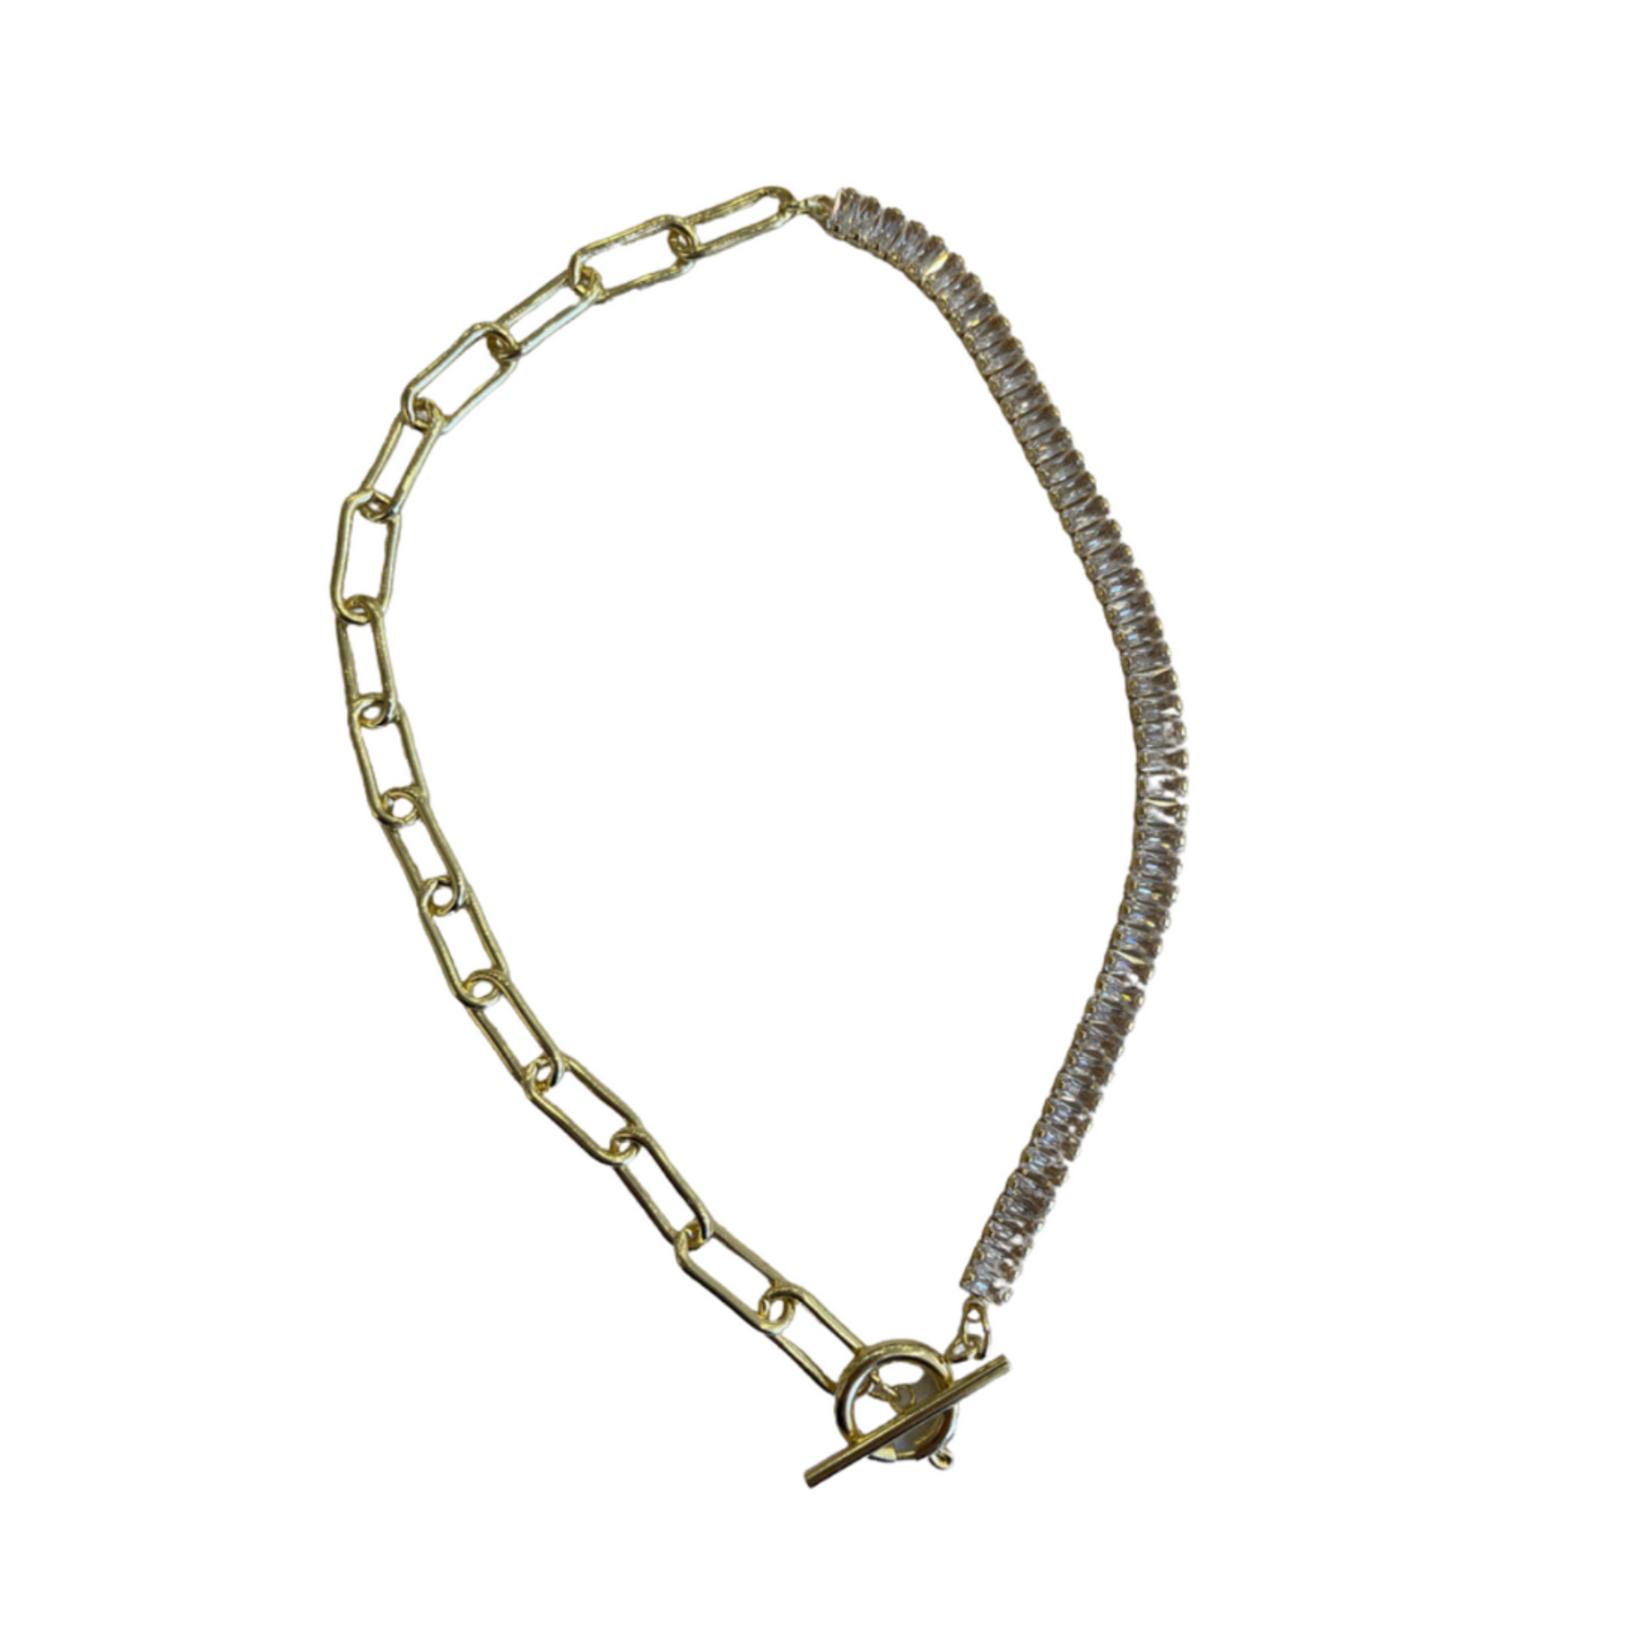 Wyld Blue Crystal & Gold Link Necklace